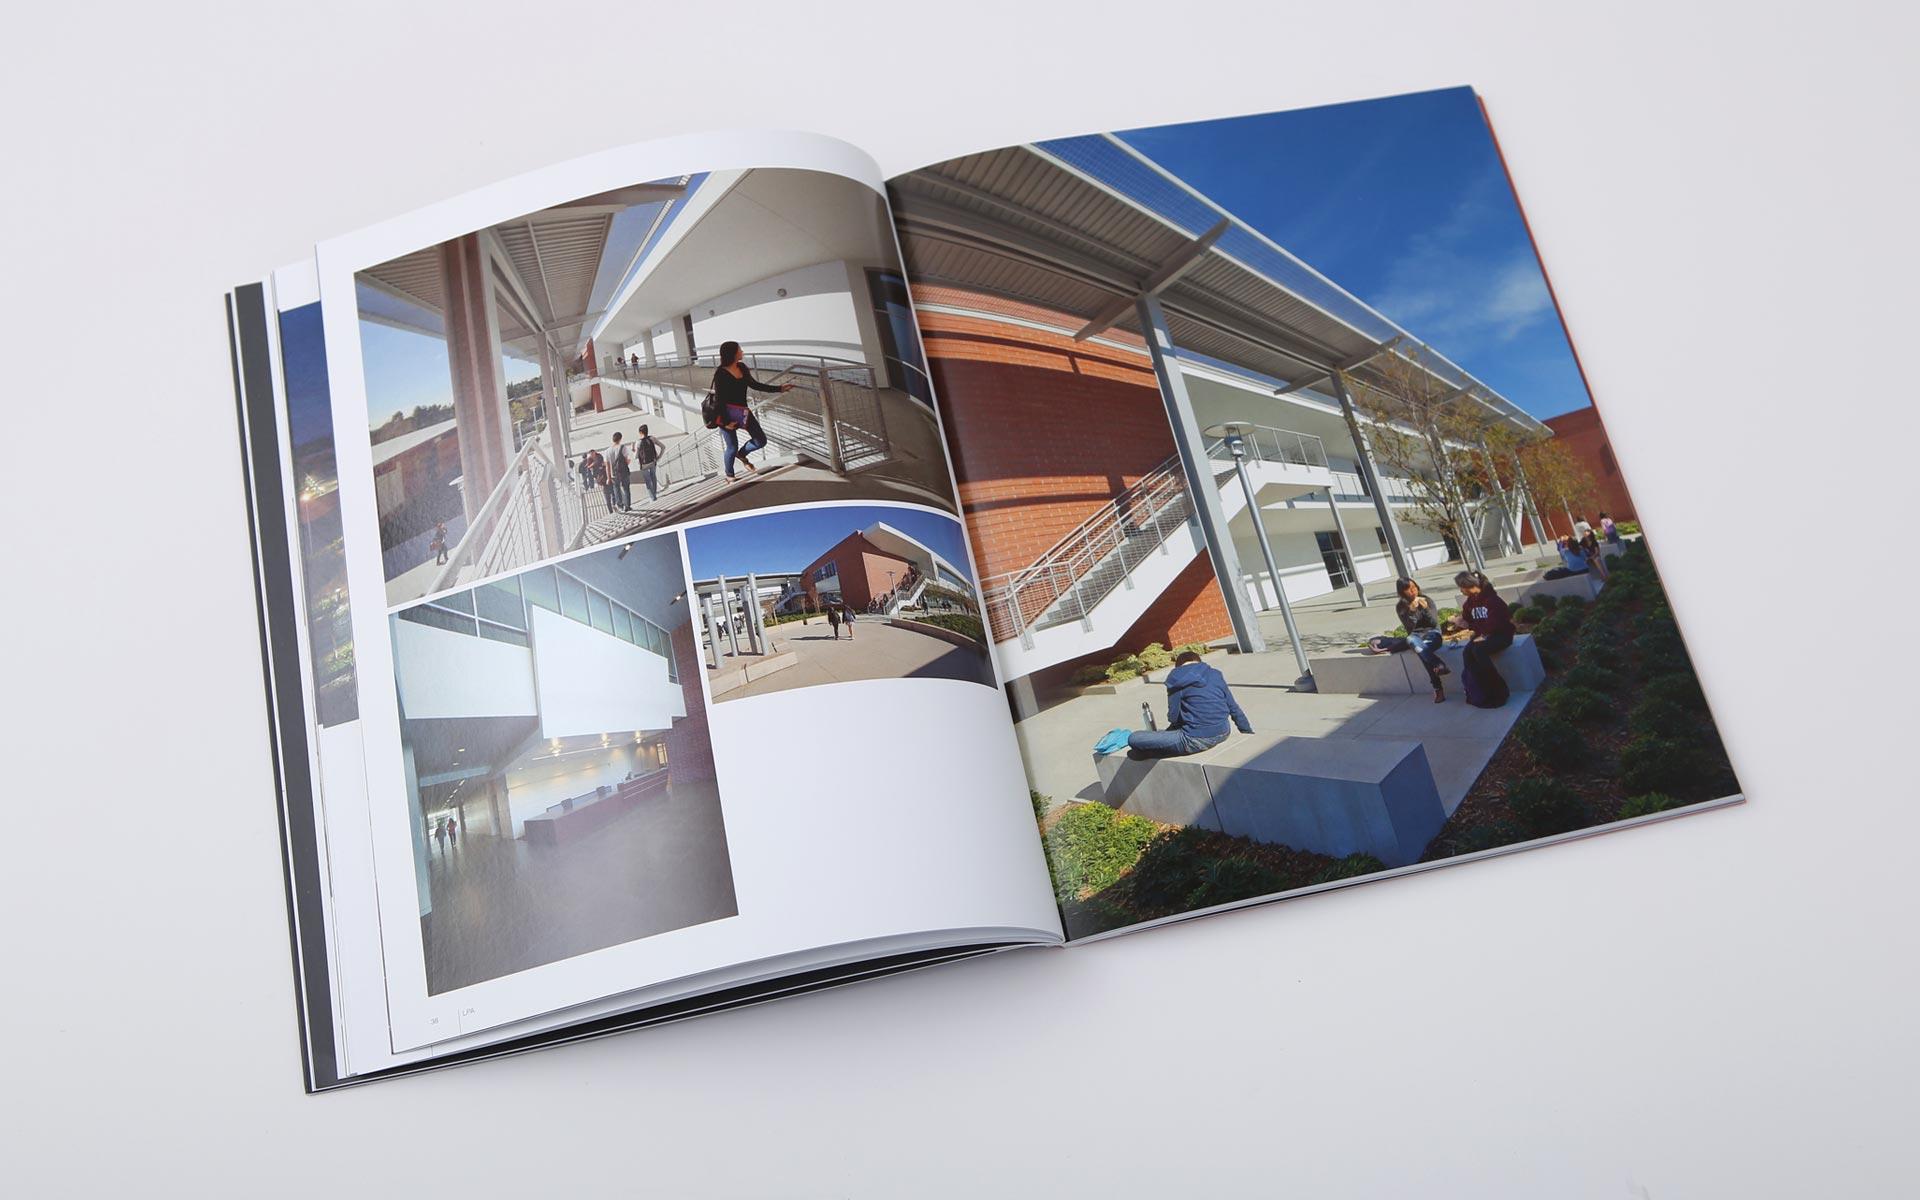 lpa-education-sports-book-design-6